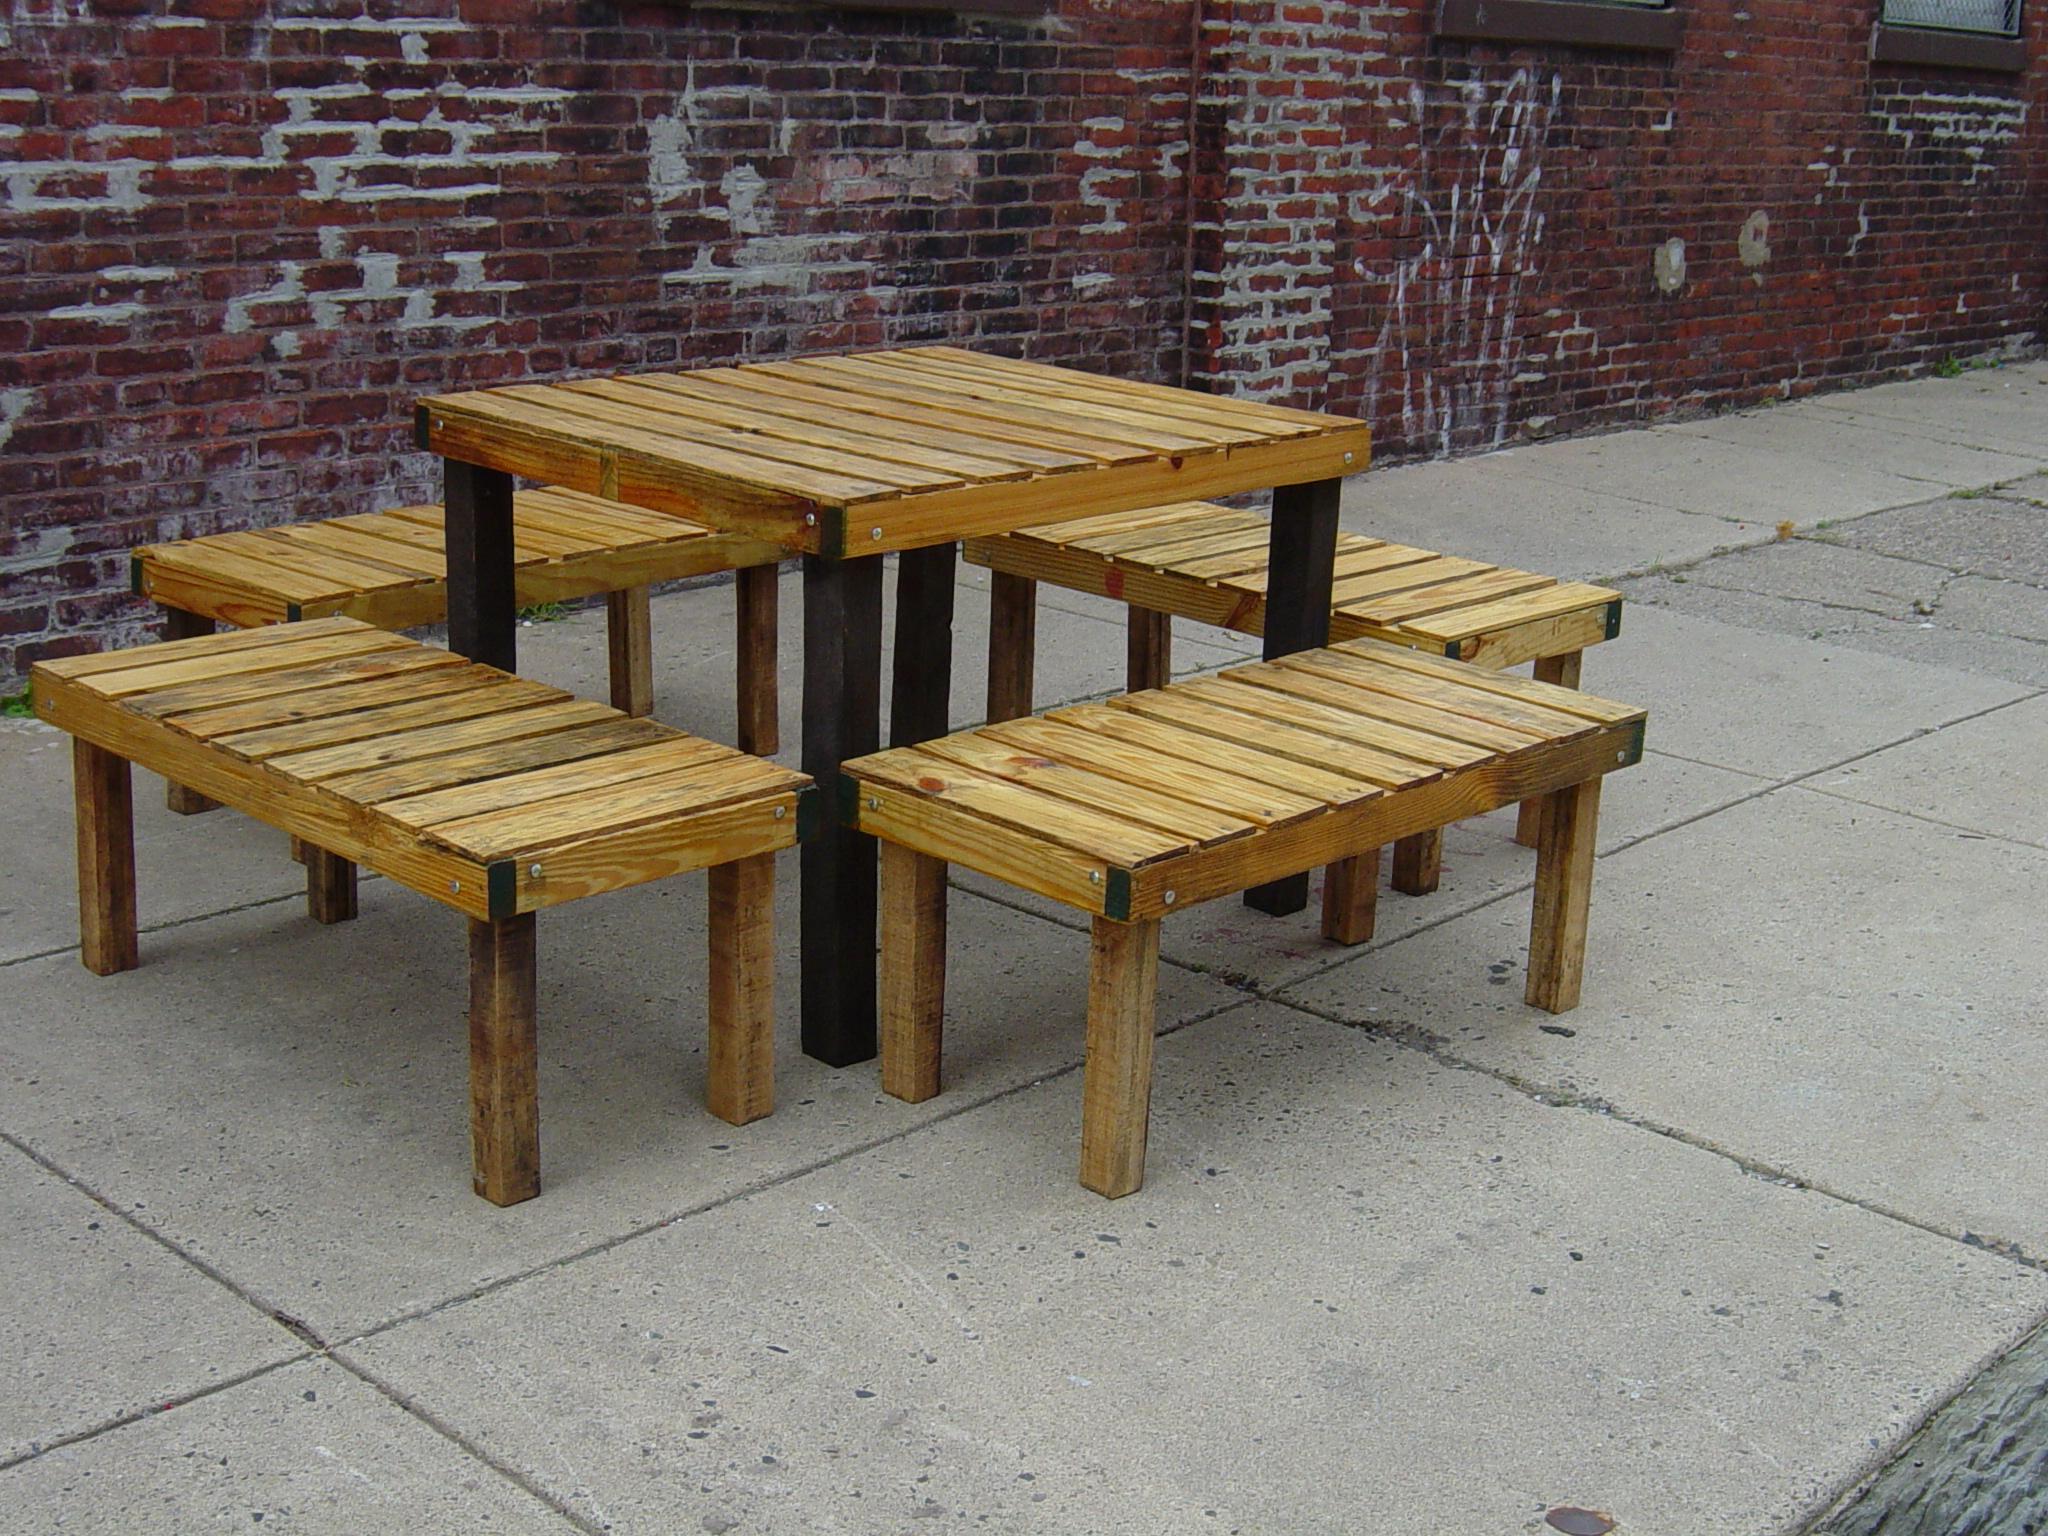 Picnic style kitchen table photo - 3